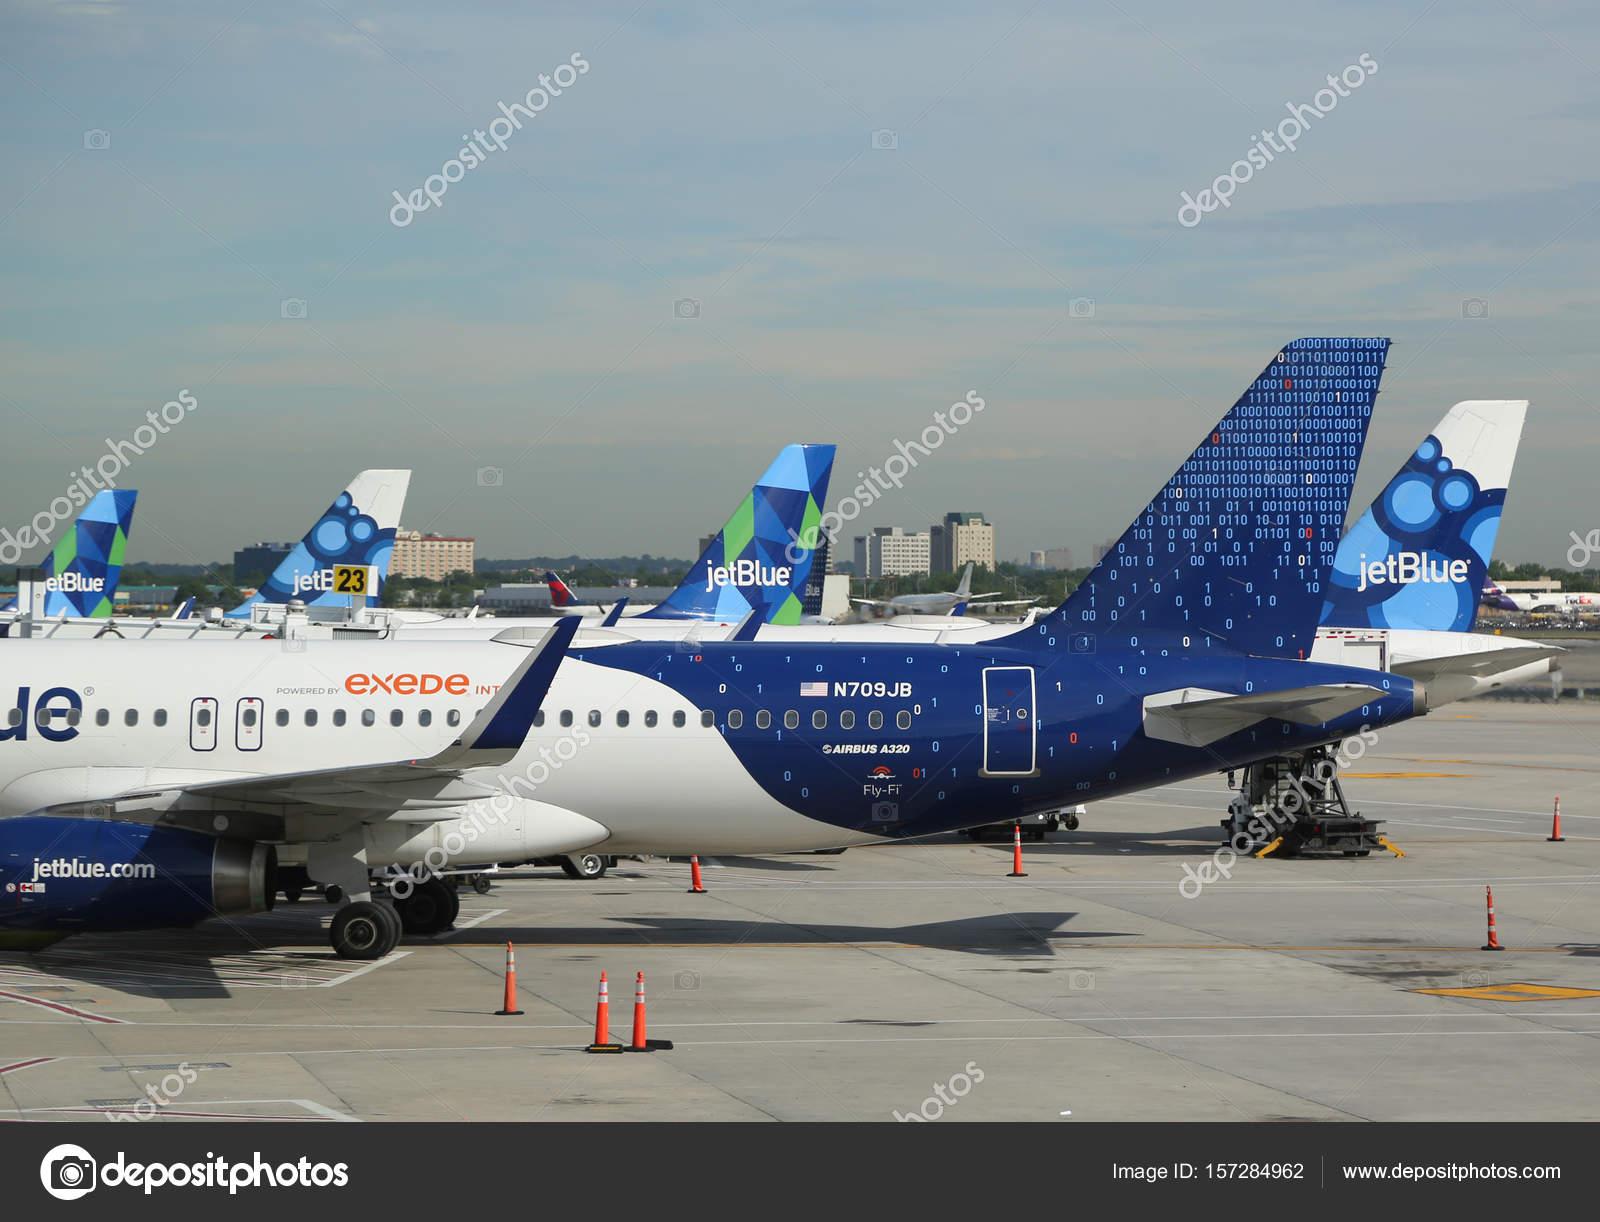 Aeroporto York : Jetblue avião na pista do aeroporto internacional john f kennedy em